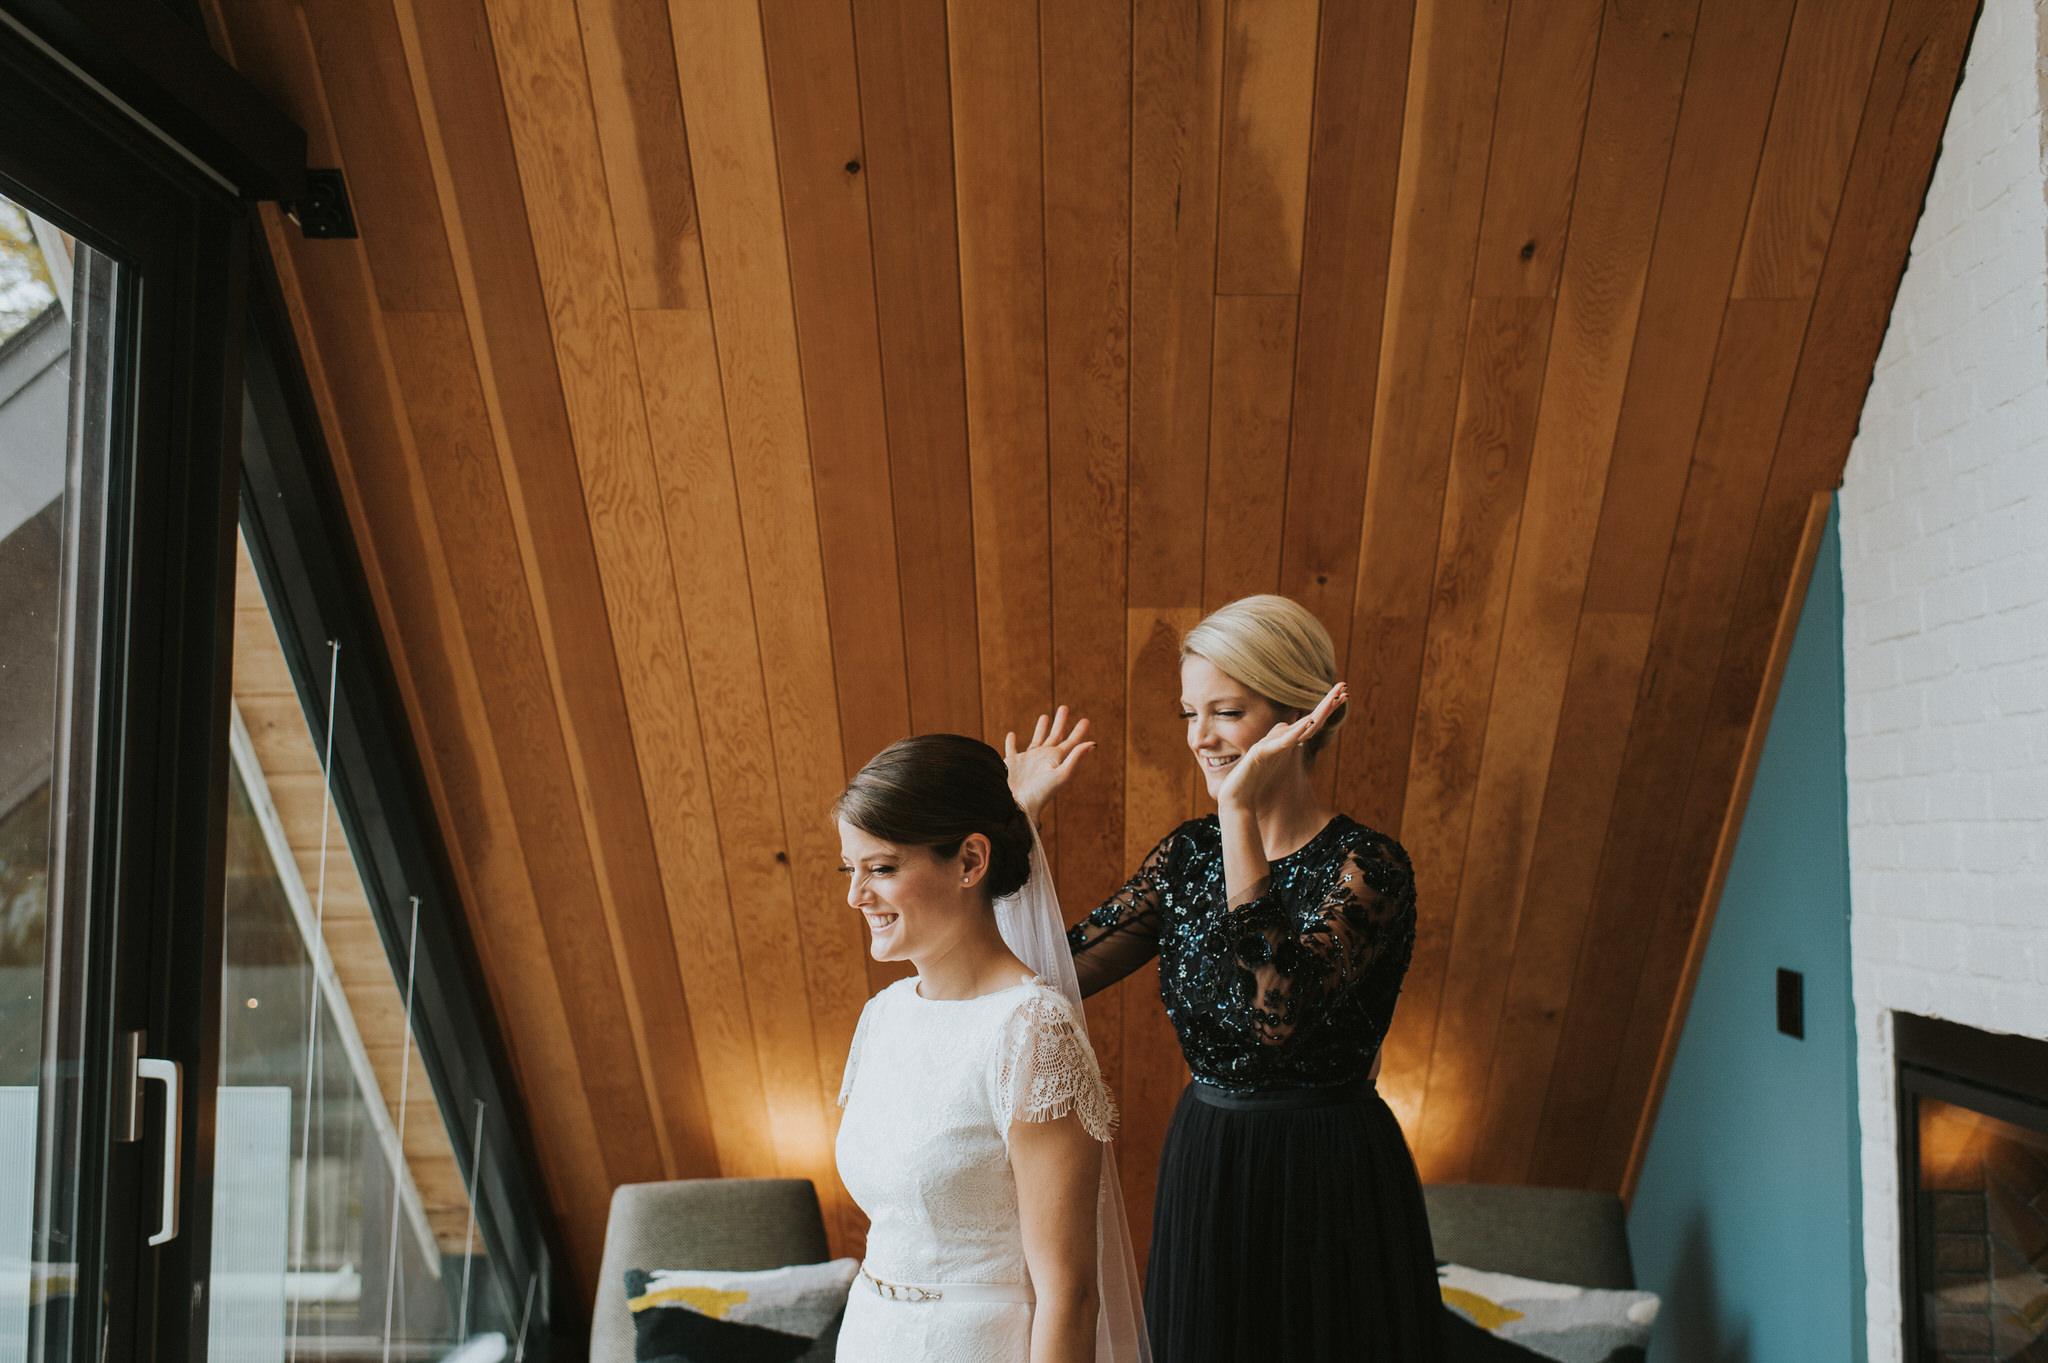 scarletoneillphotography_weddingphotography_prince edward county weddings030.JPG